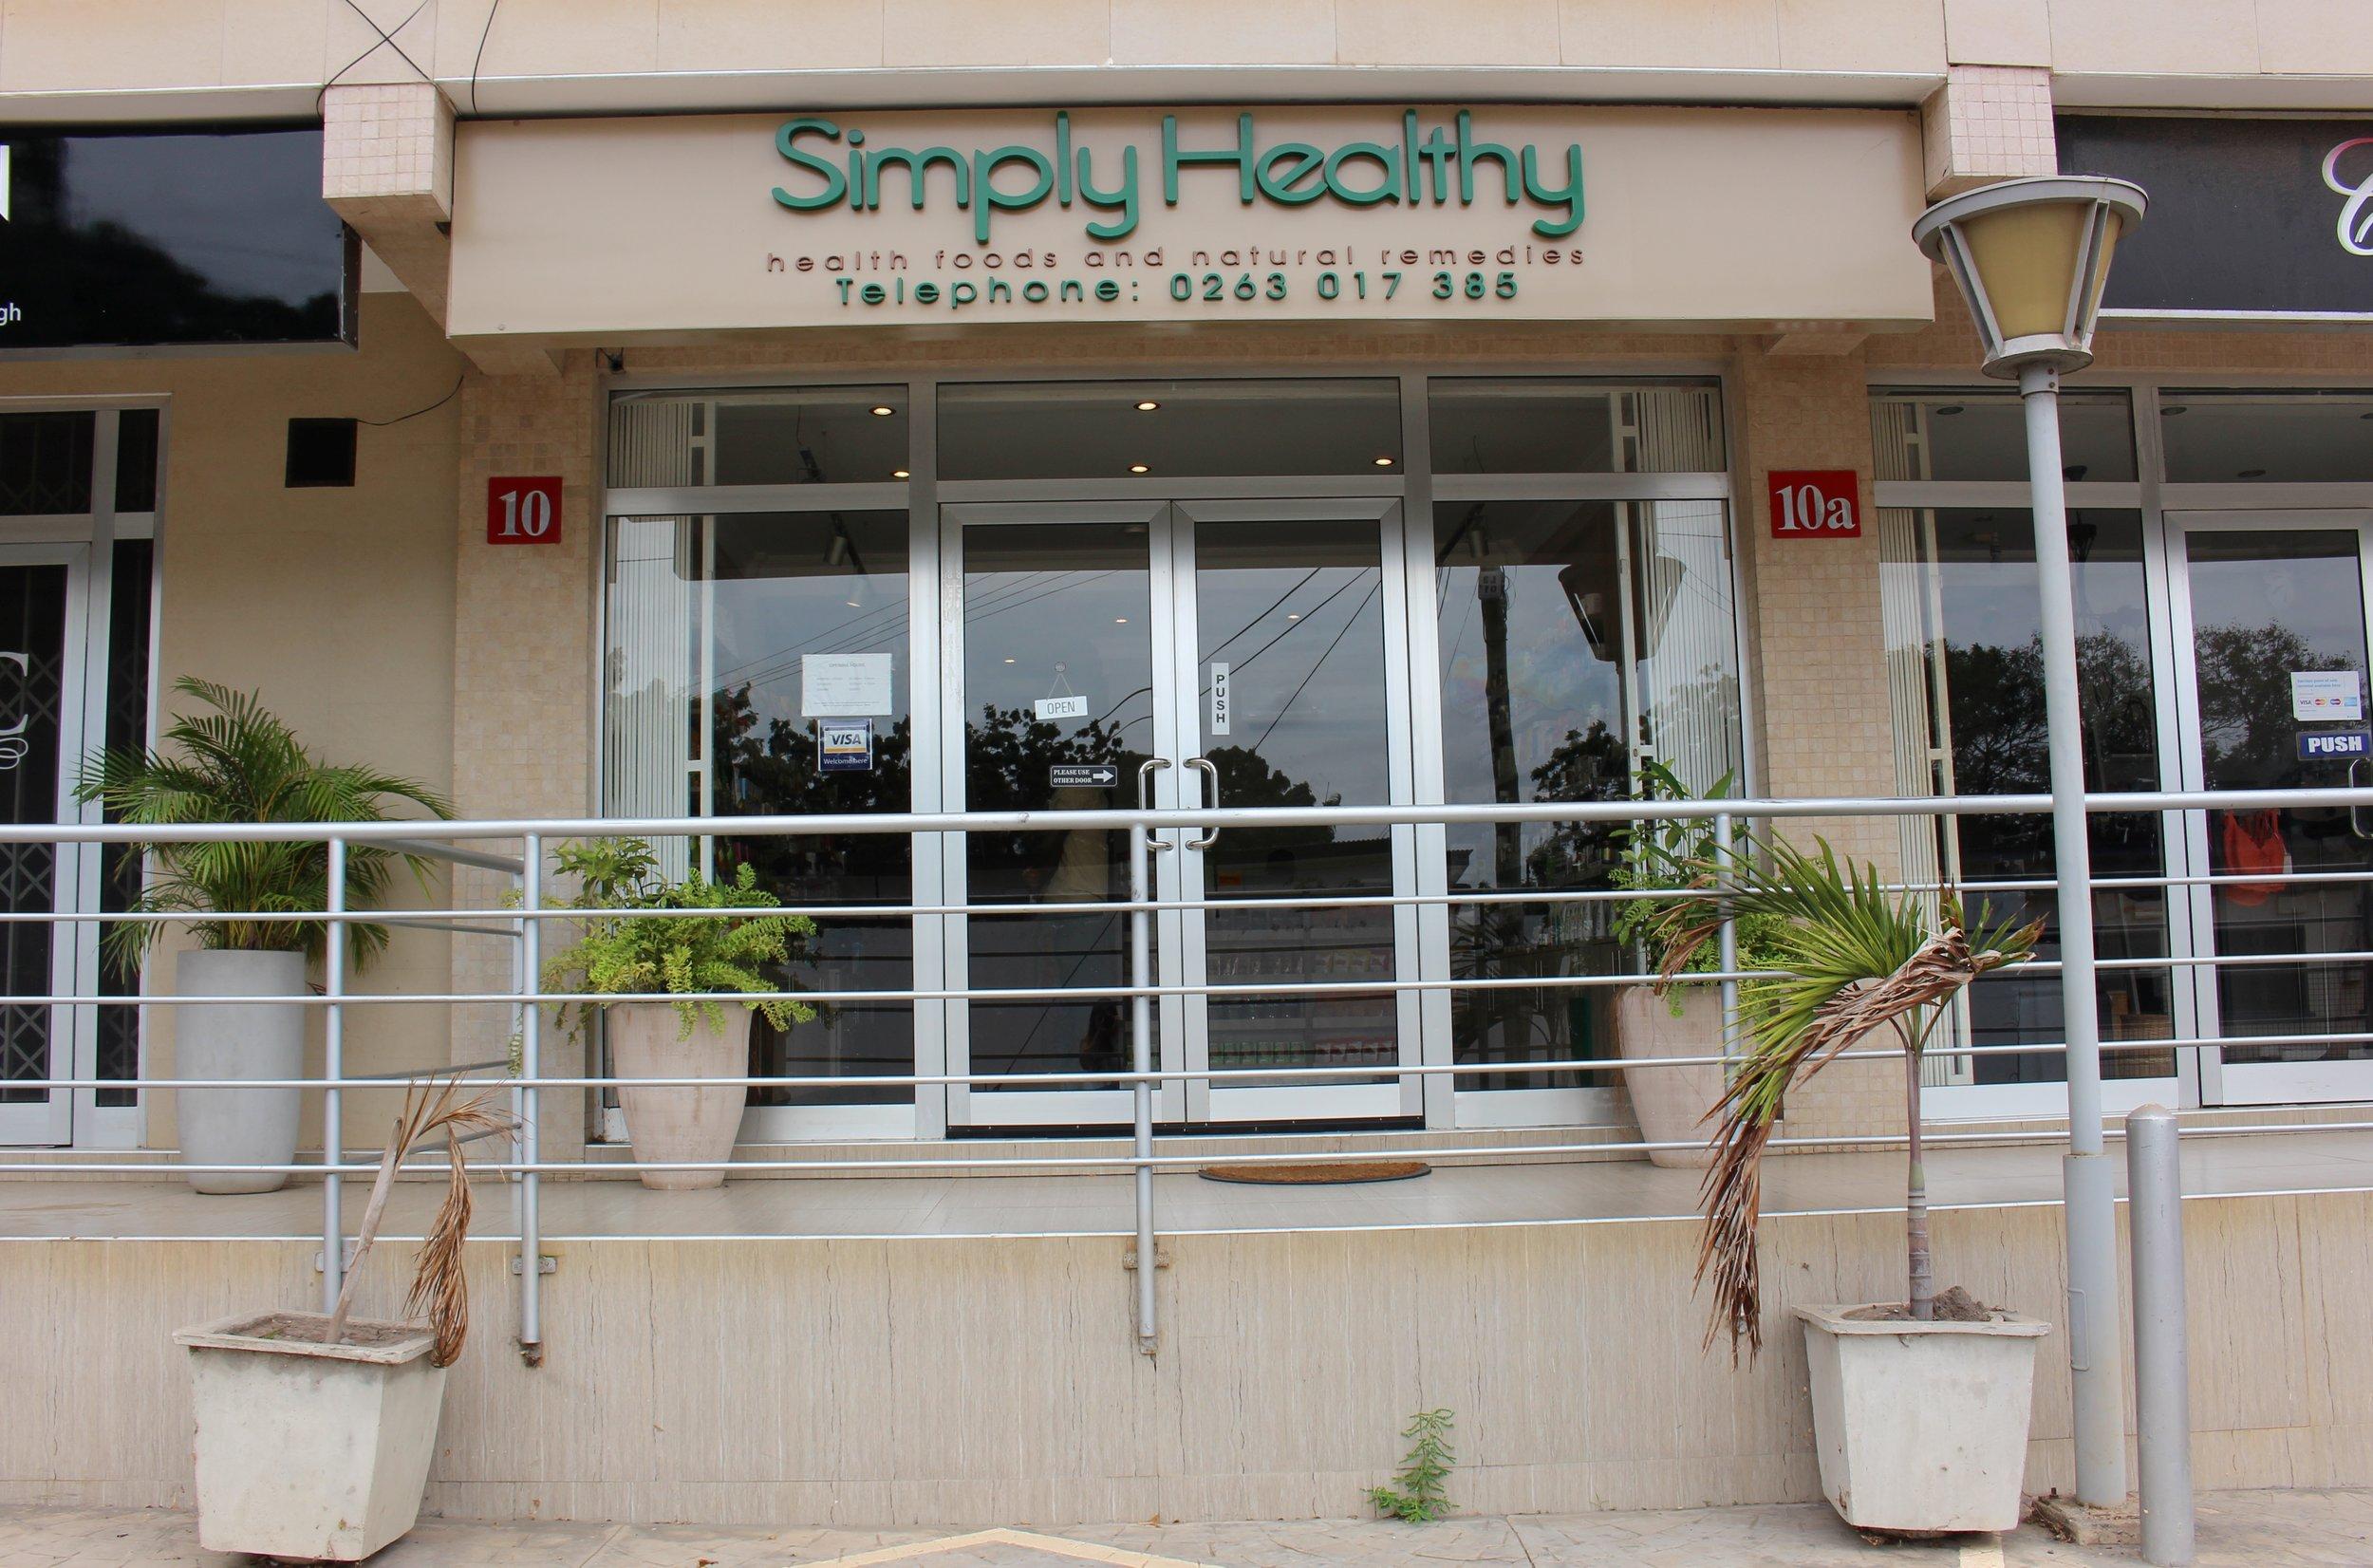 Simply Healthy  Labone Arcade, Orphan Crescent  026 301 7385